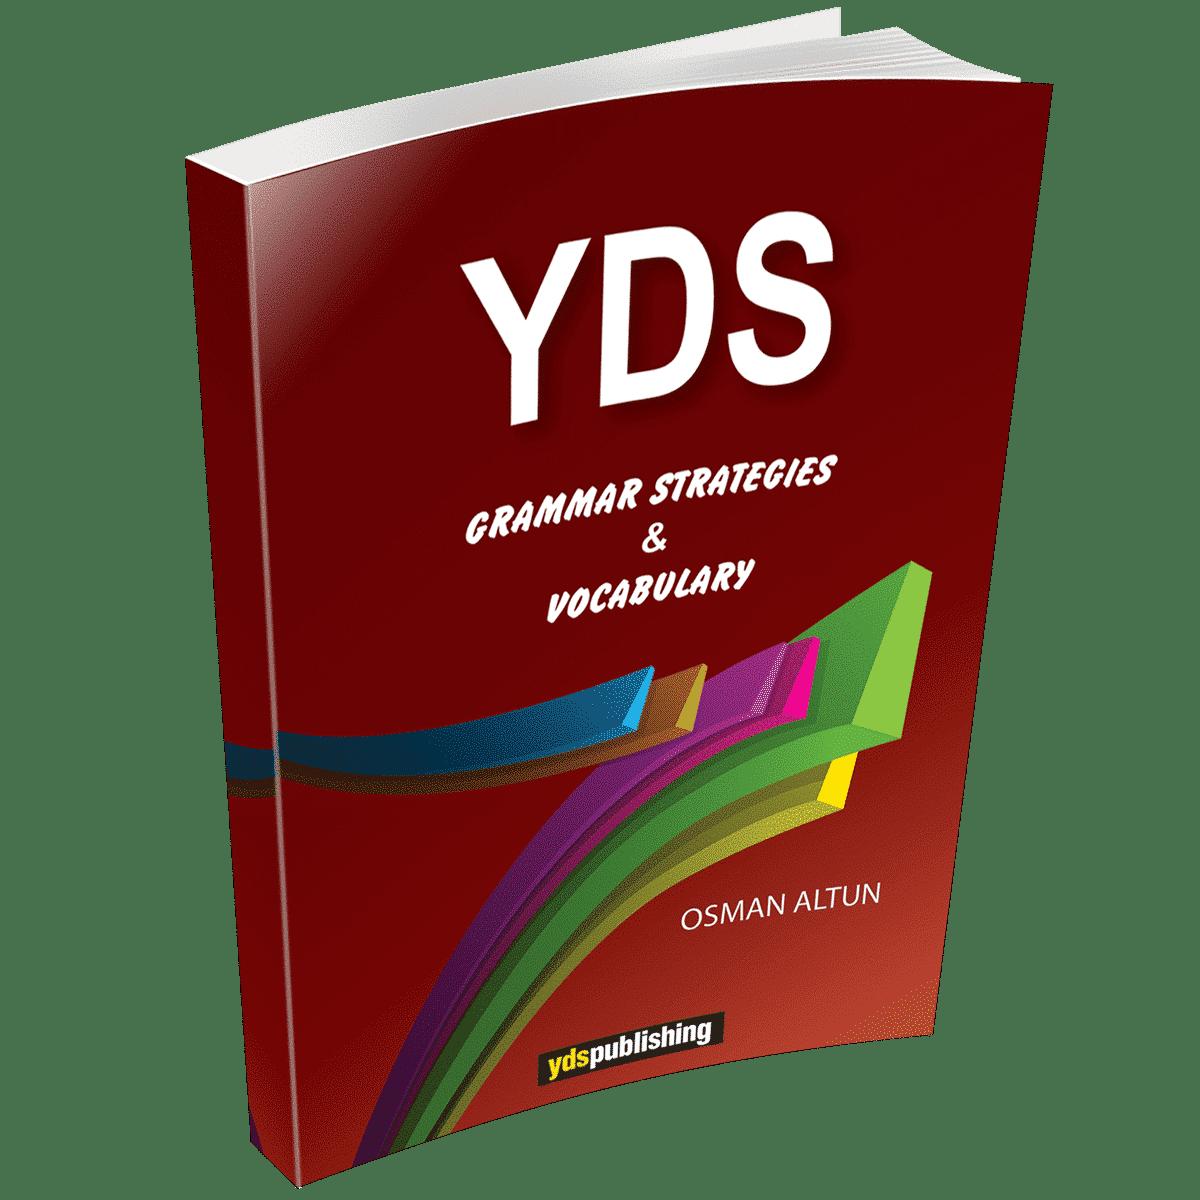 YDS Grammar Strategies & Vocabulary yds grammar strategies & vocabulary -  YDS Grammar Strategies & Vocabulary